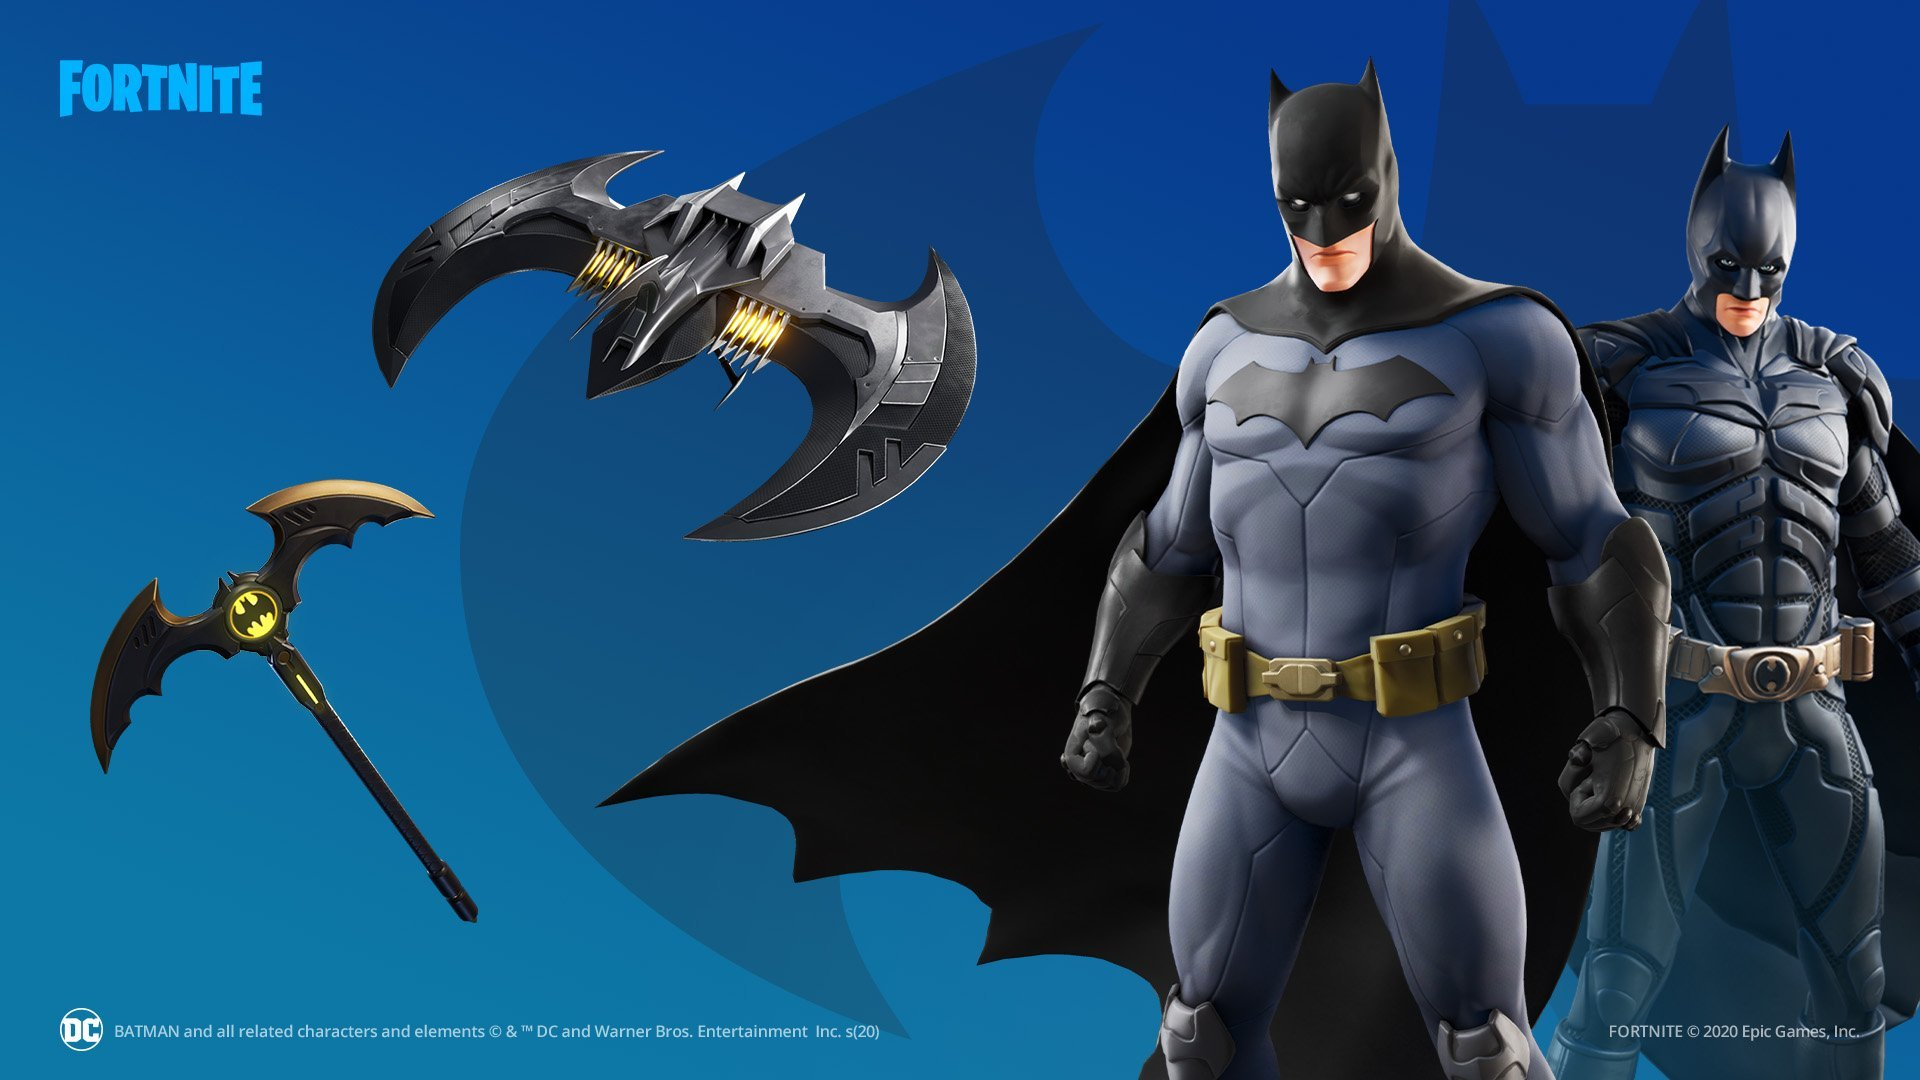 Batman Fortnite skin